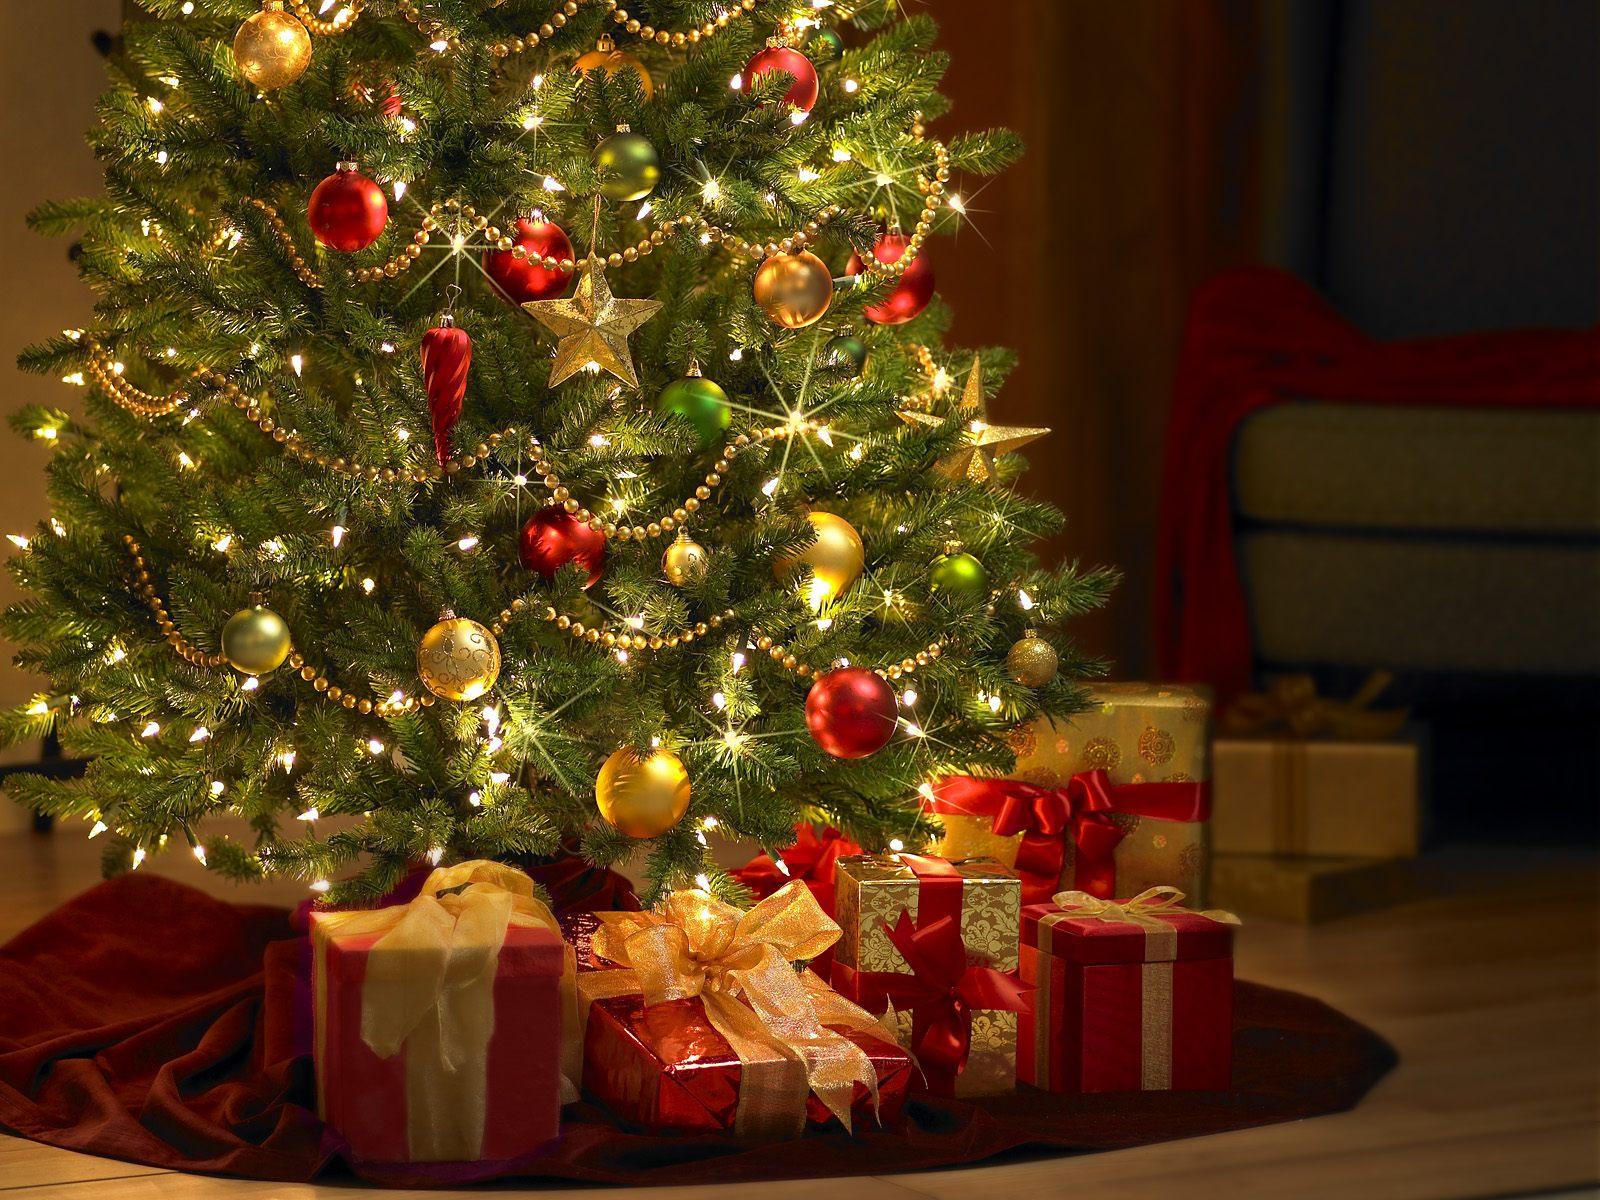 http://4.bp.blogspot.com/-76mERsRiaww/TvJdE8tv2SI/AAAAAAAAEJs/ZEQeIpC71ZM/s1600/christmas-tree-xmas-balls-decoration-pao.jpg